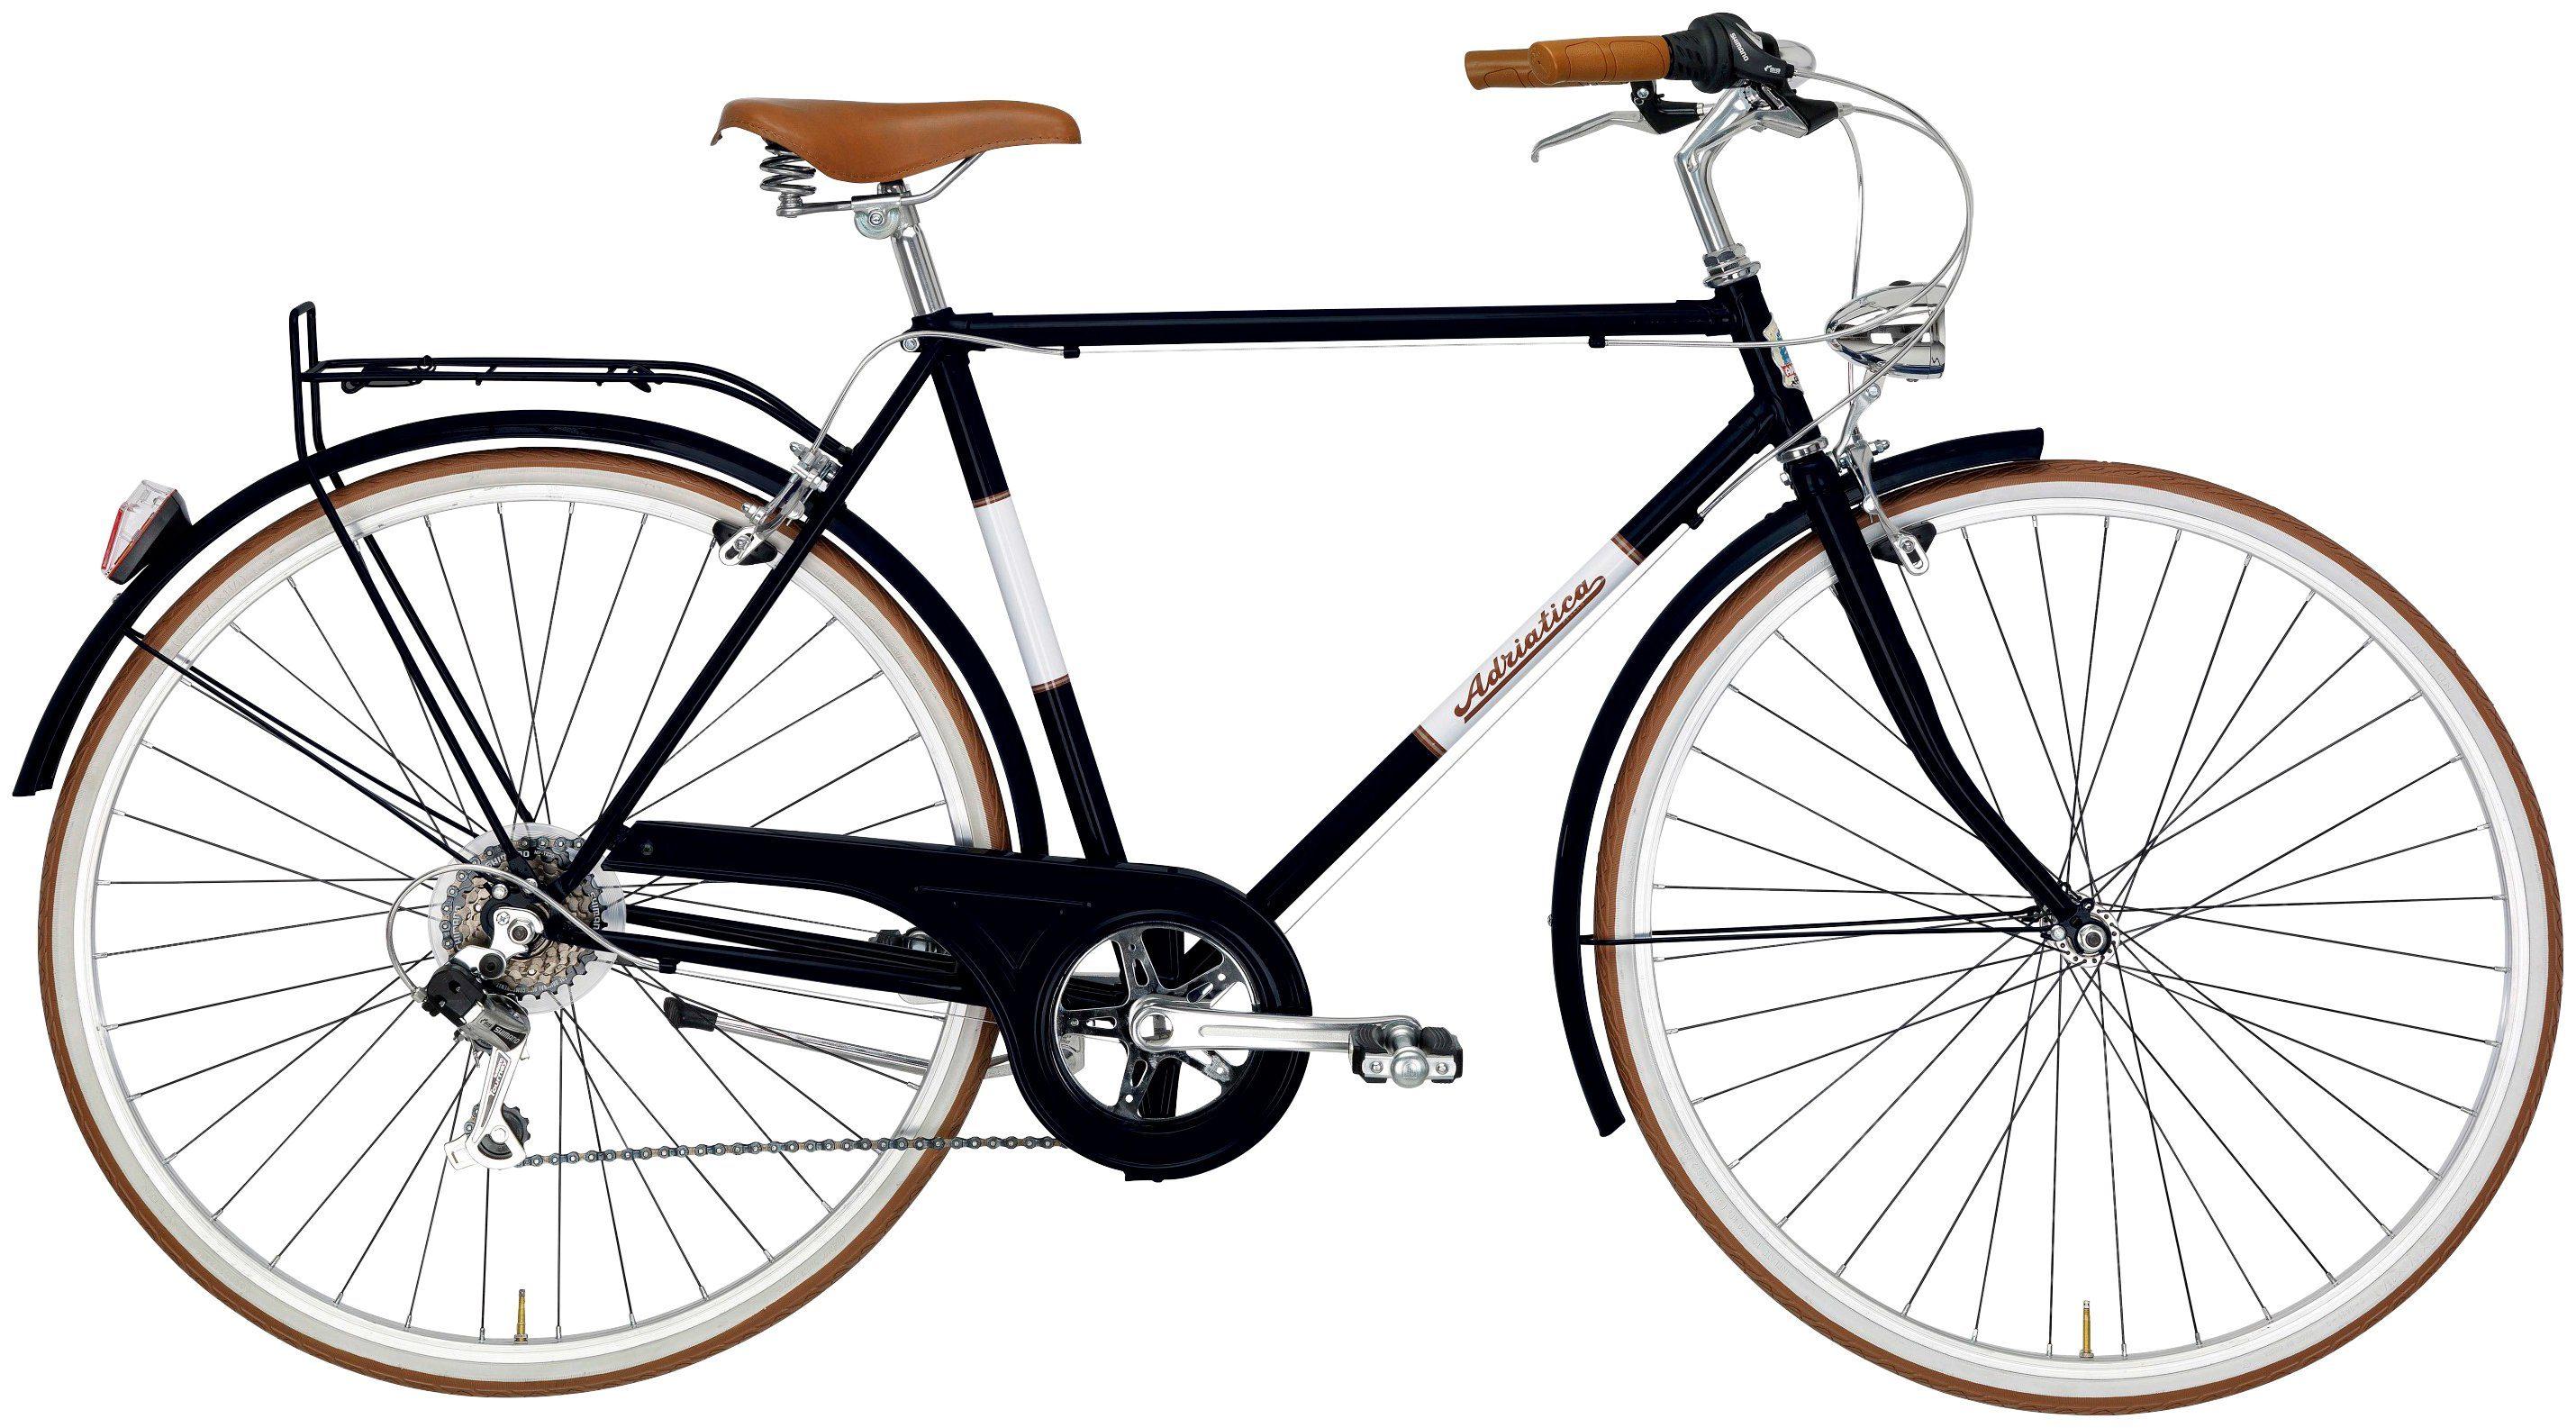 Citybike Herren »Condorino«, 28 Zoll, 6 Gang, Felgenbremse